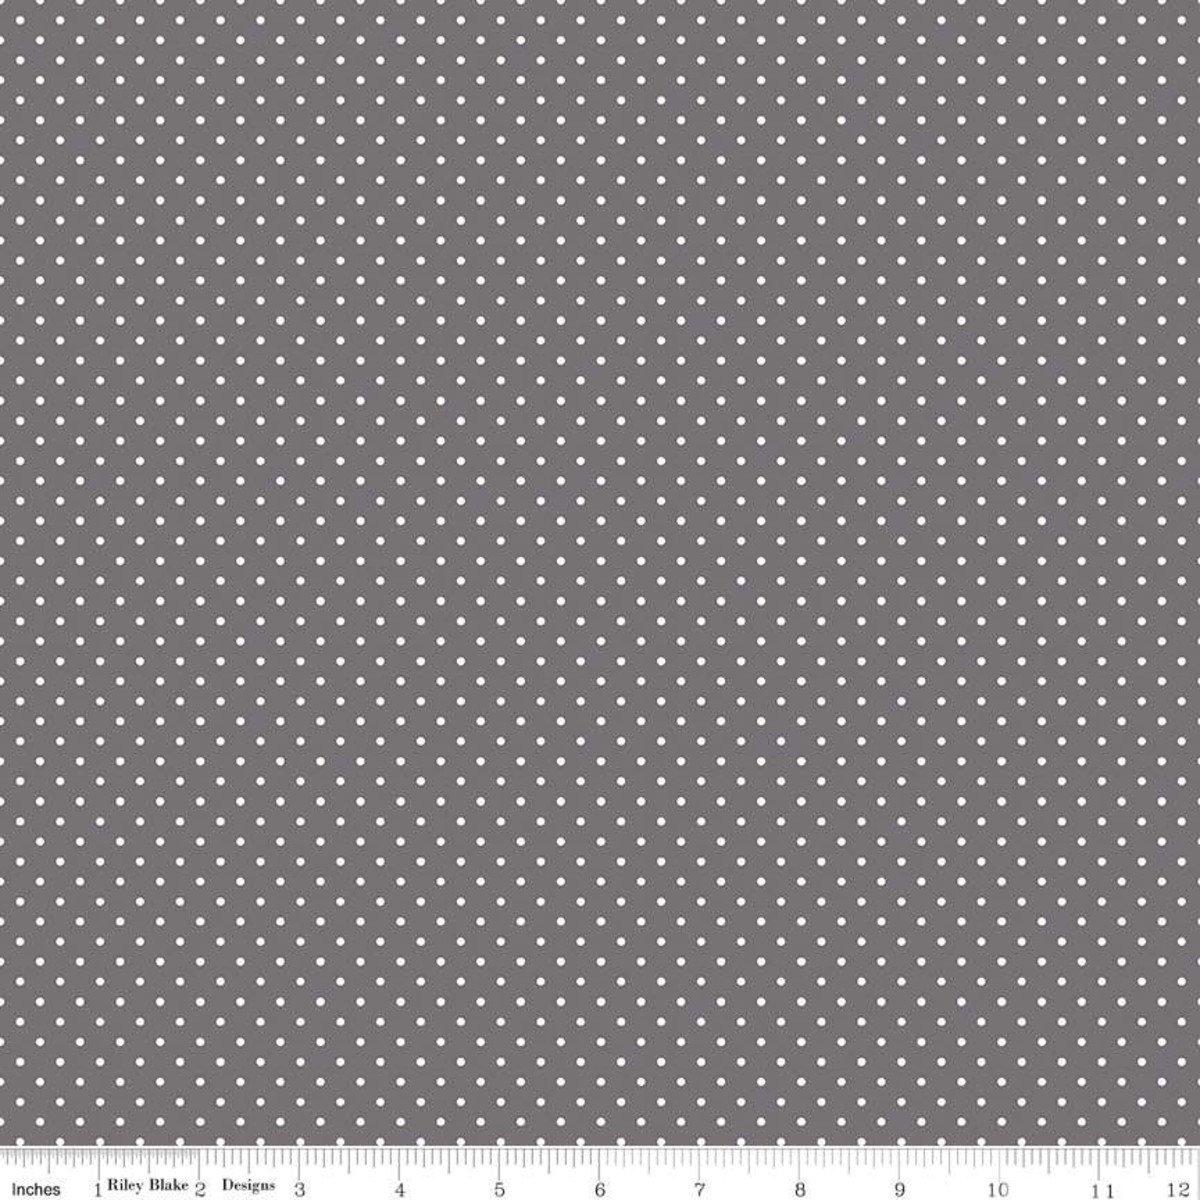 Riley Blake Designs, Swiss Dot - Swiss Dot Steel